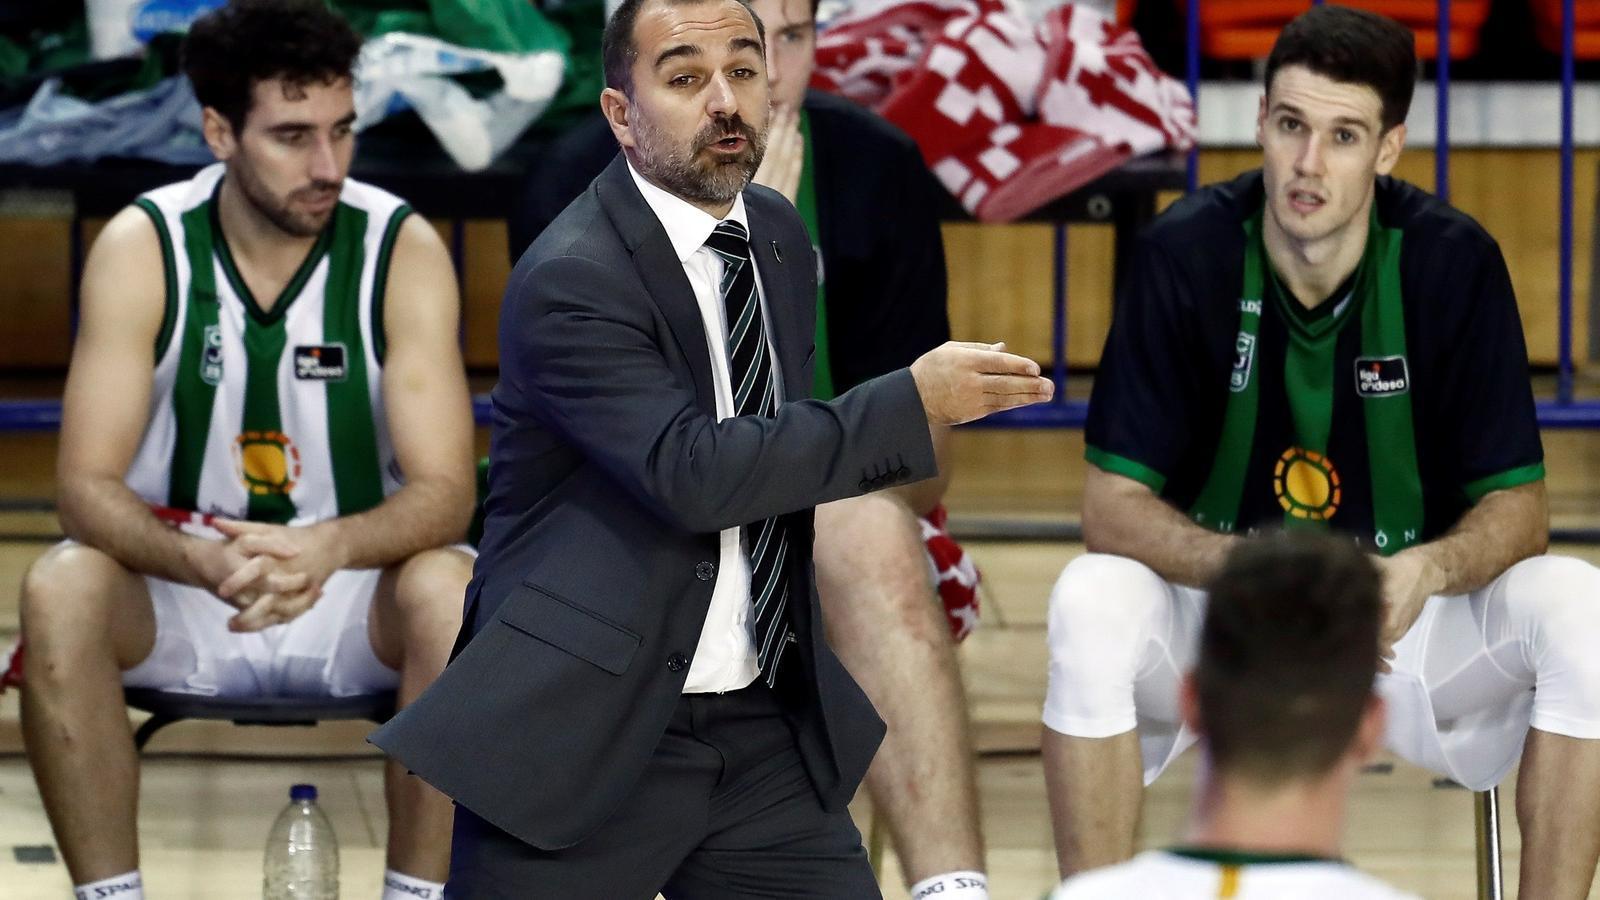 Carles Duran, a Fuenlabrada